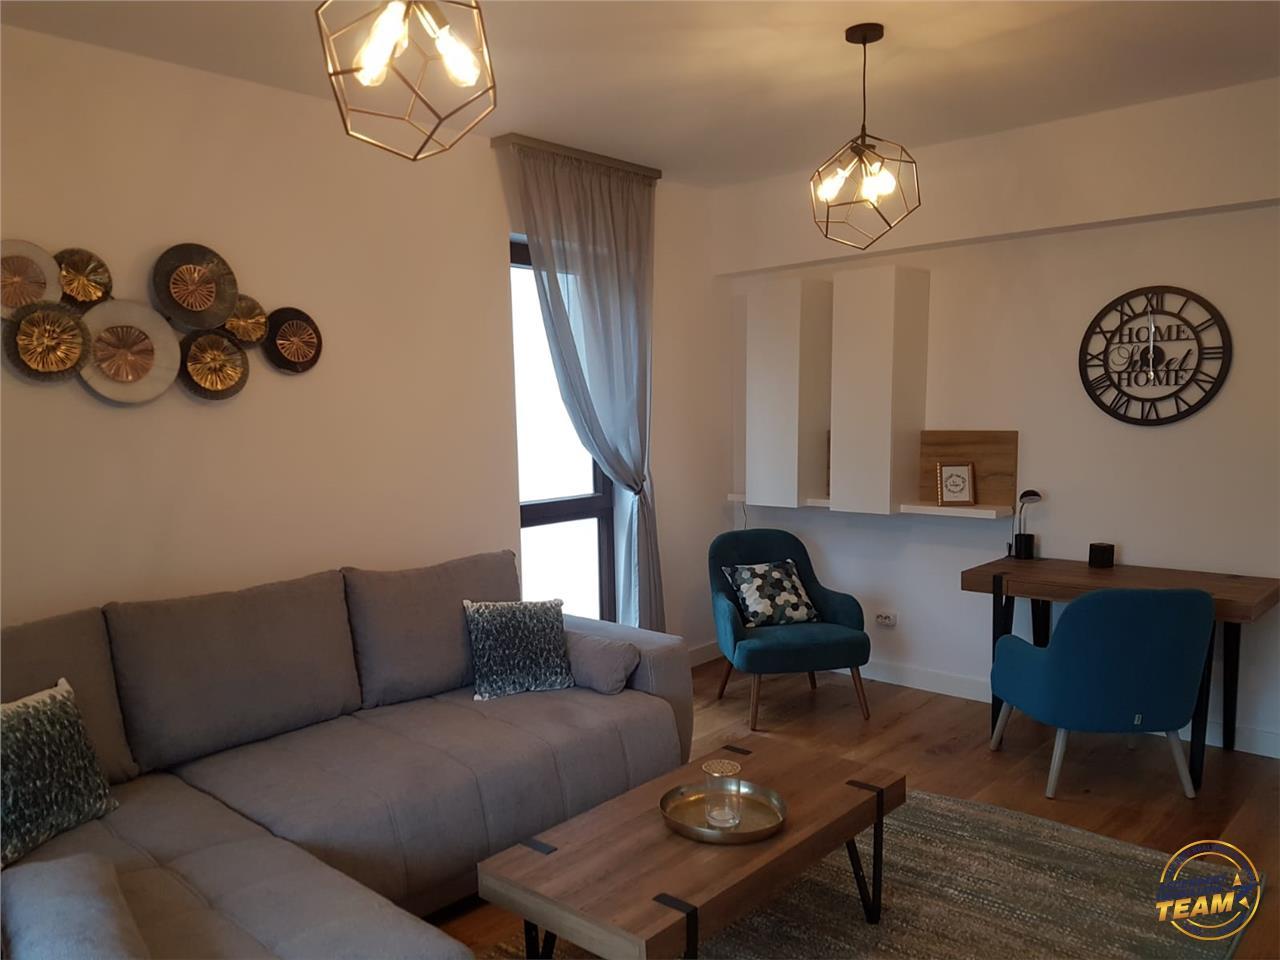 OFERTA REZERVATA!!Speciala proprietate, constructie noua, garaj subteran, Central, Brasov